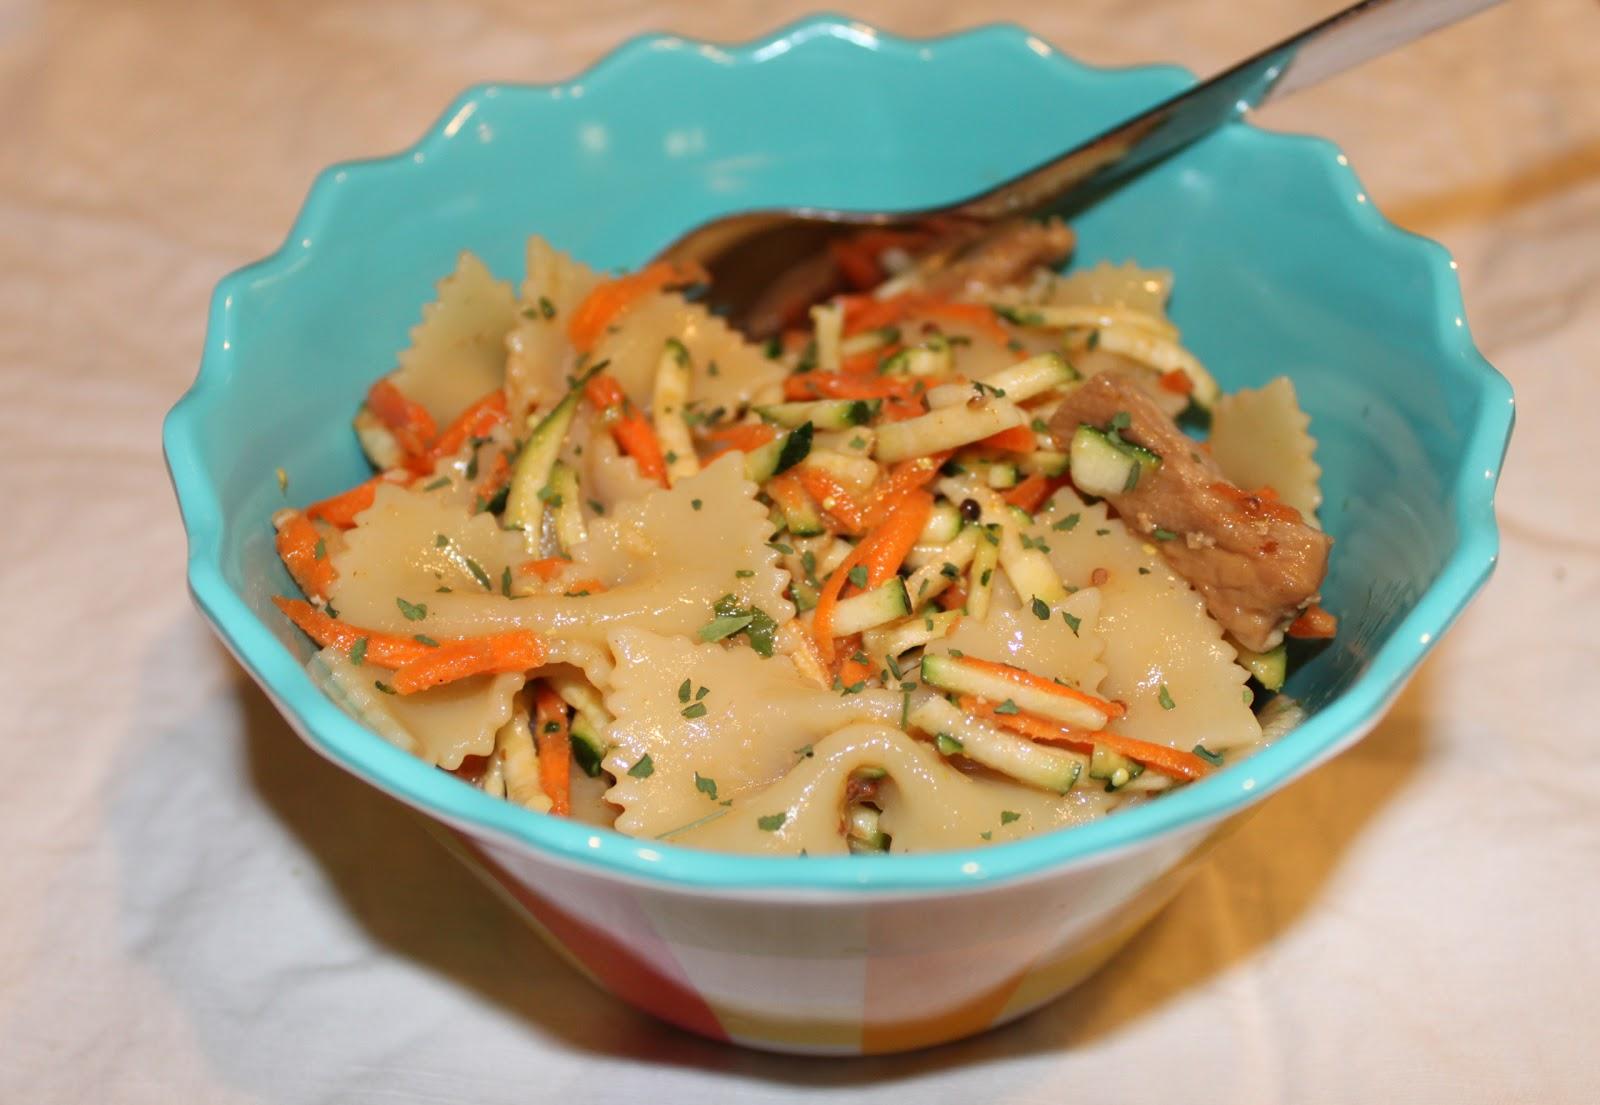 Petits repas entre amis salade mixte farfalles crudit s for Petits repas entre amis